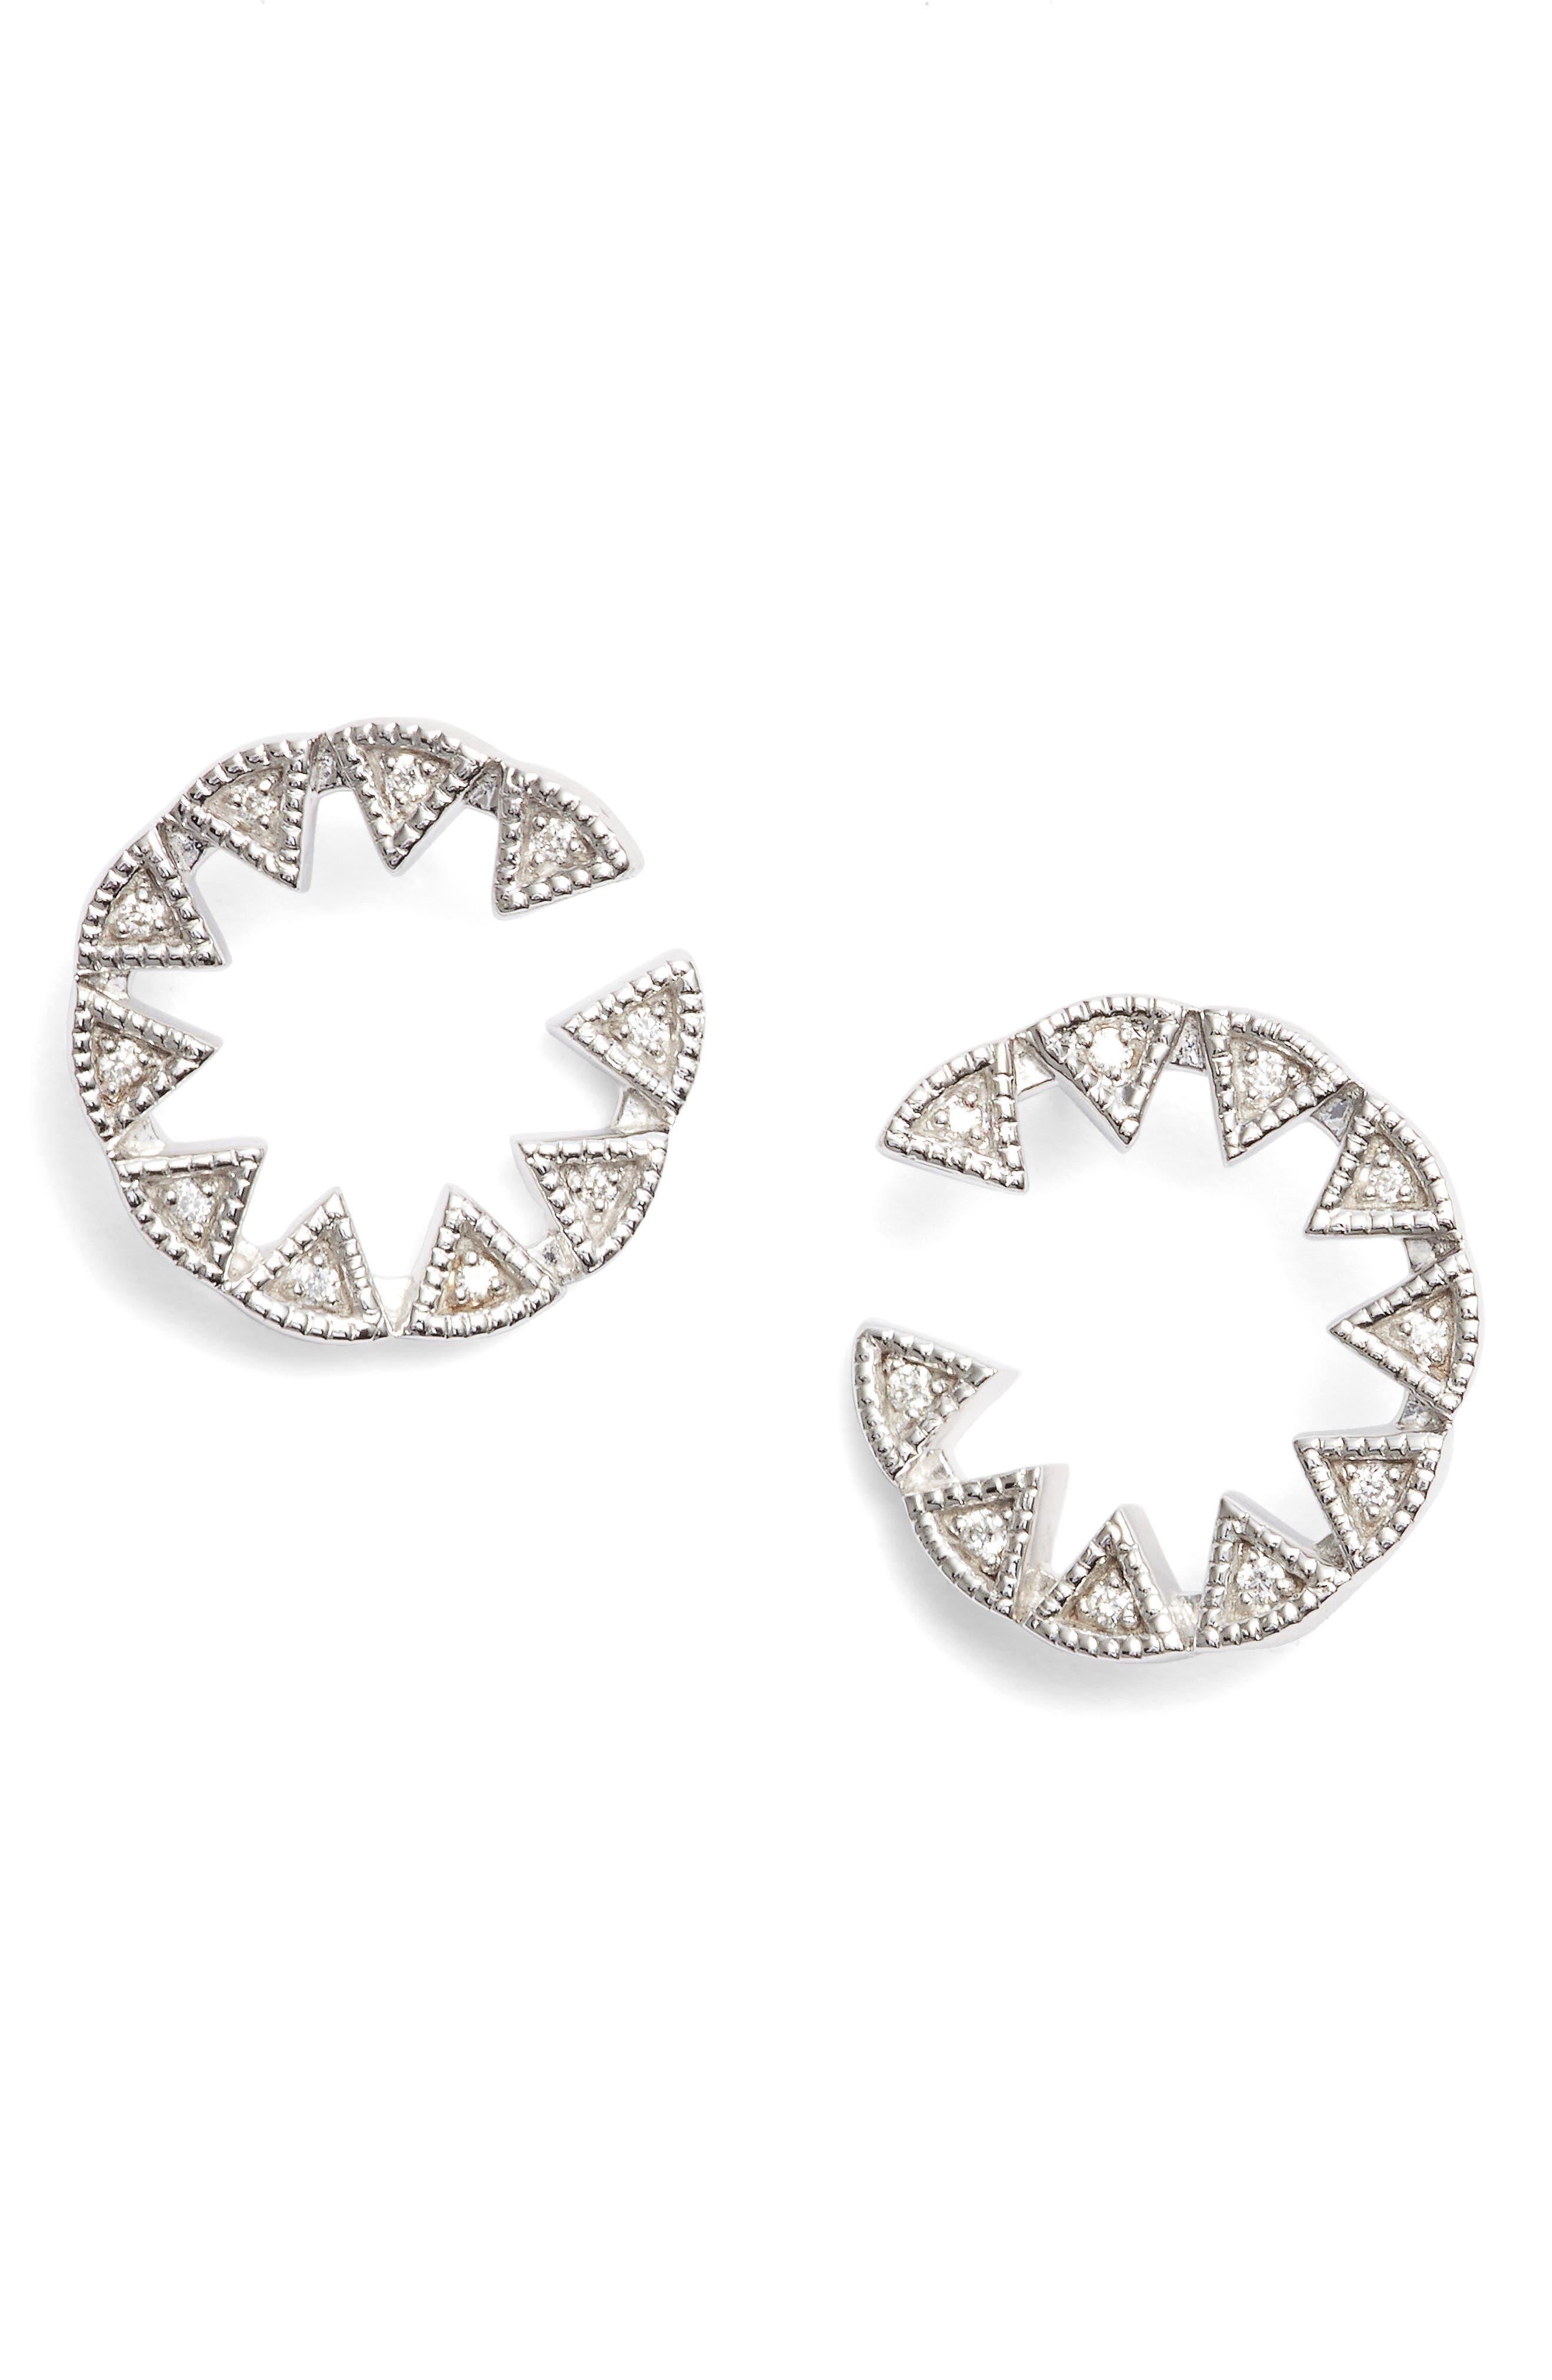 Alternate Image 1 Selected - Dana Rebecca Designs Emily Sarah Triangle Diamond Stud Earrings